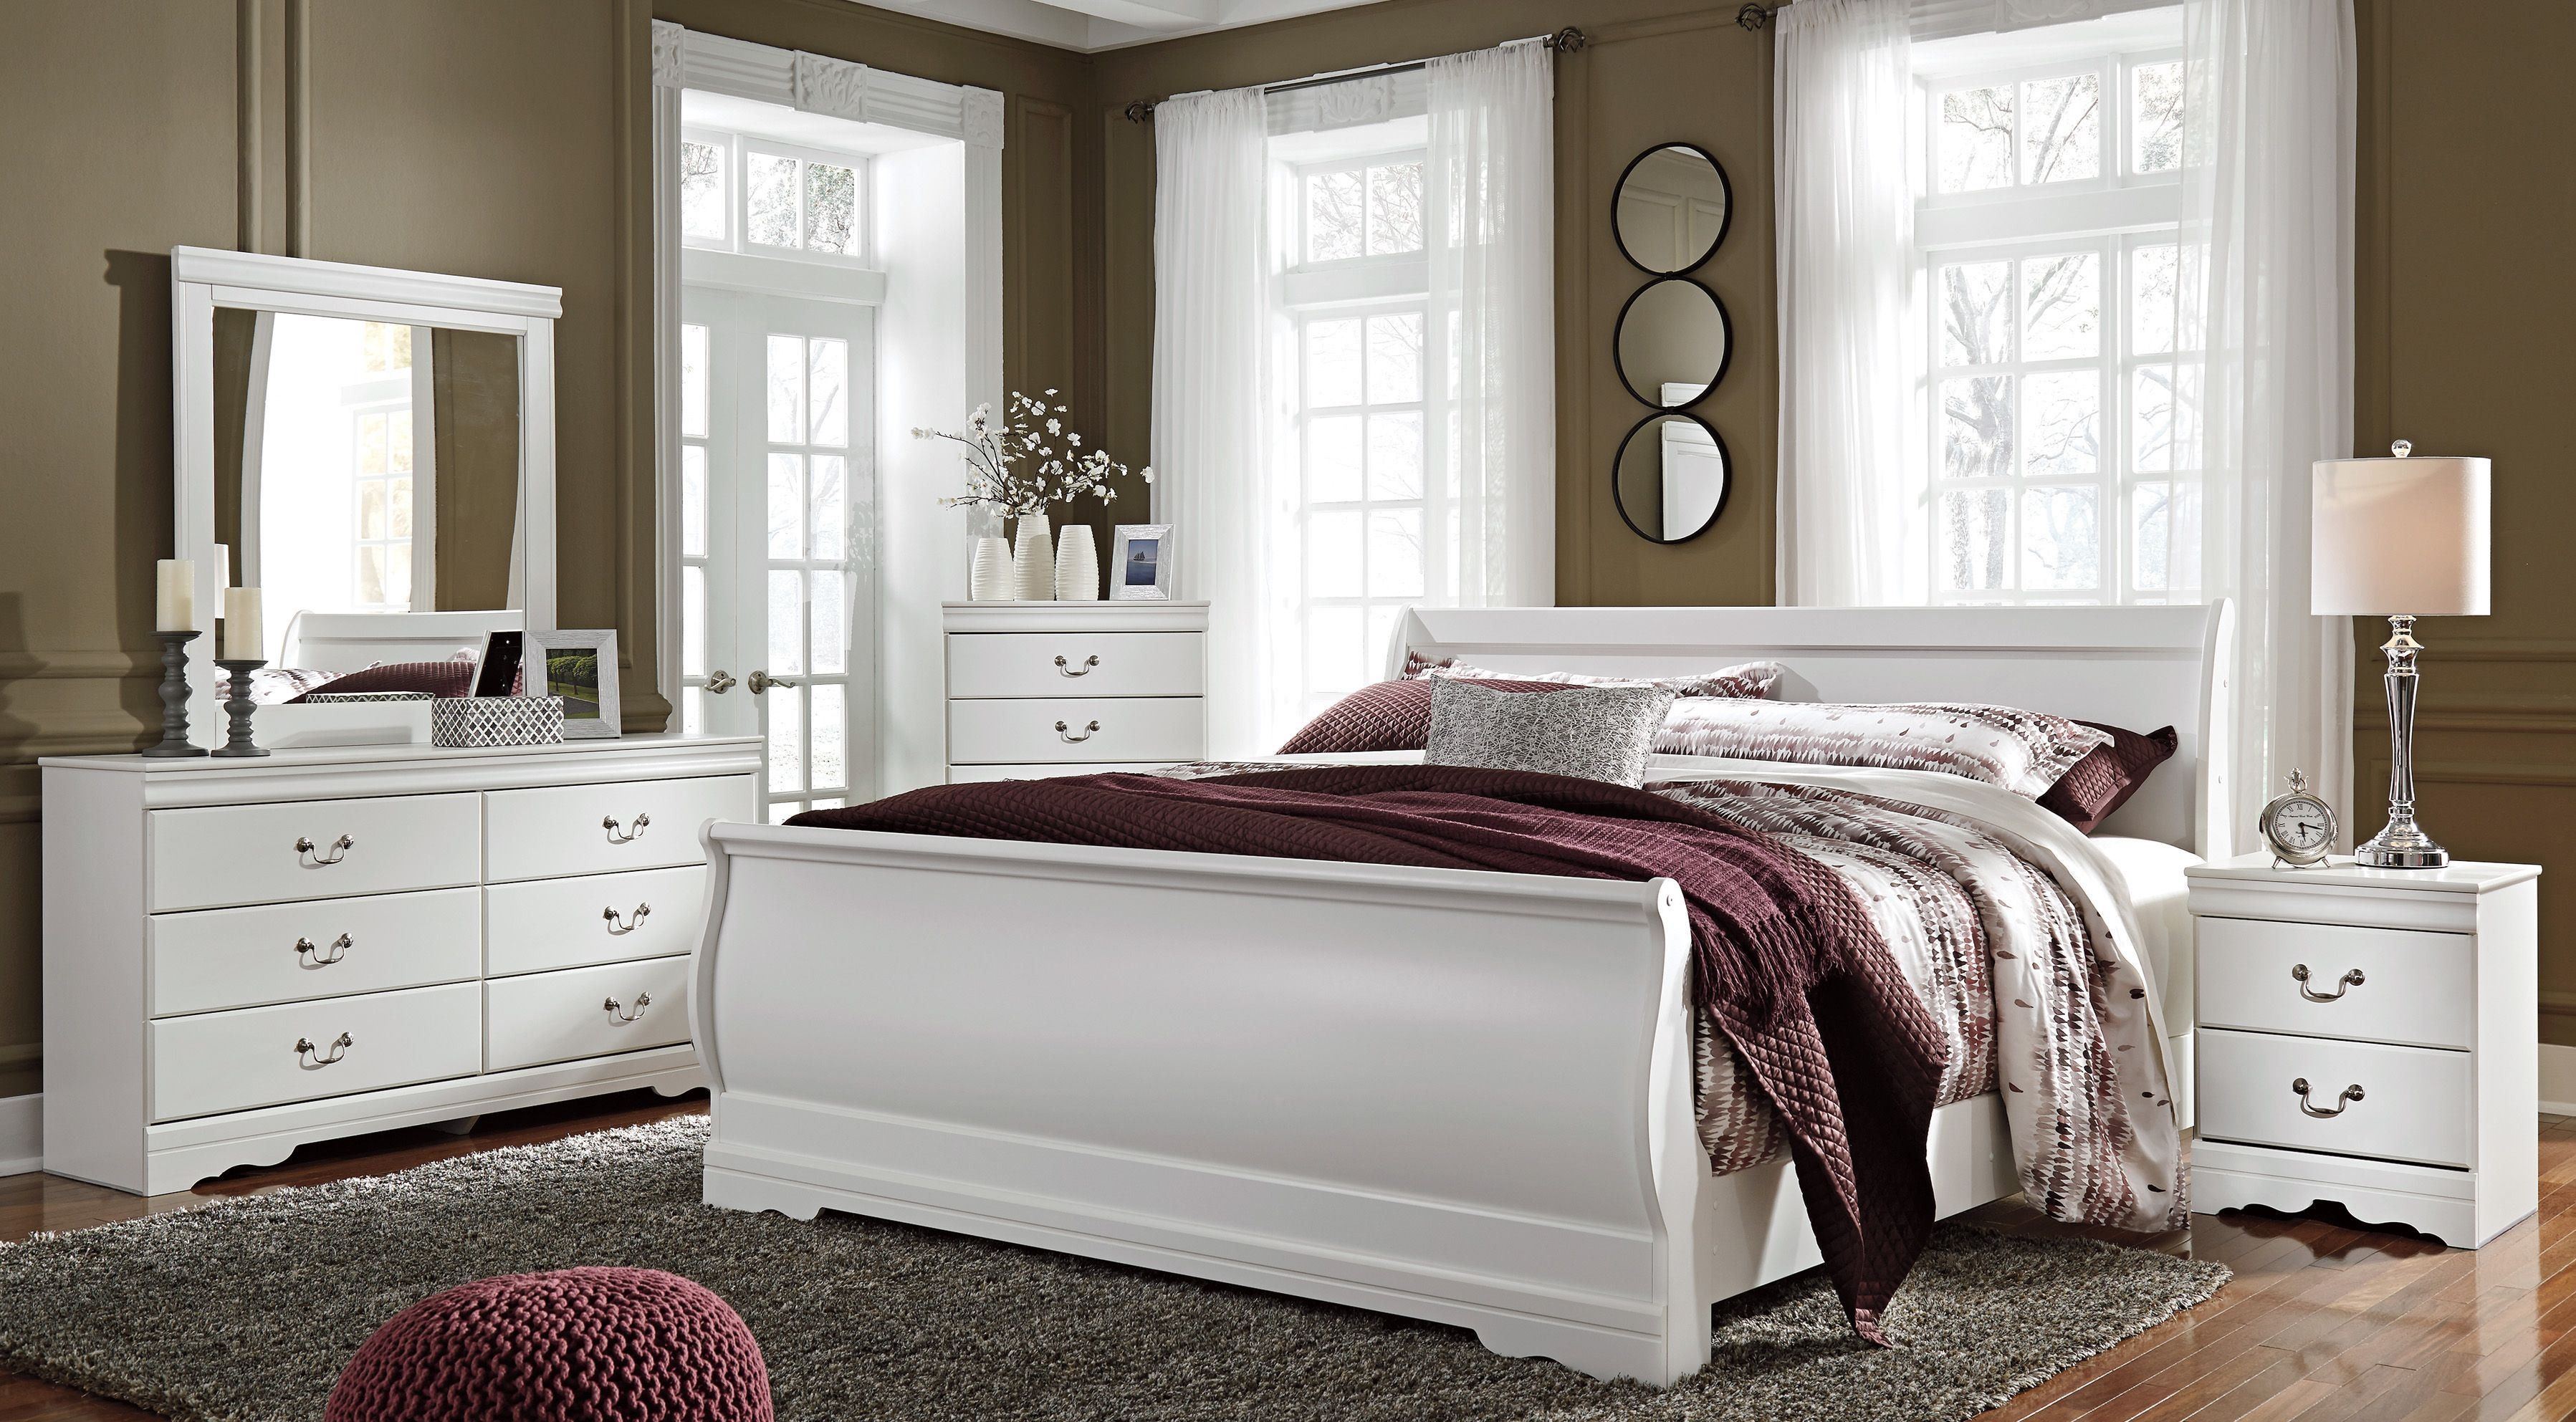 Anarasia White Sleigh Bedroom Set Bedroom sets queen